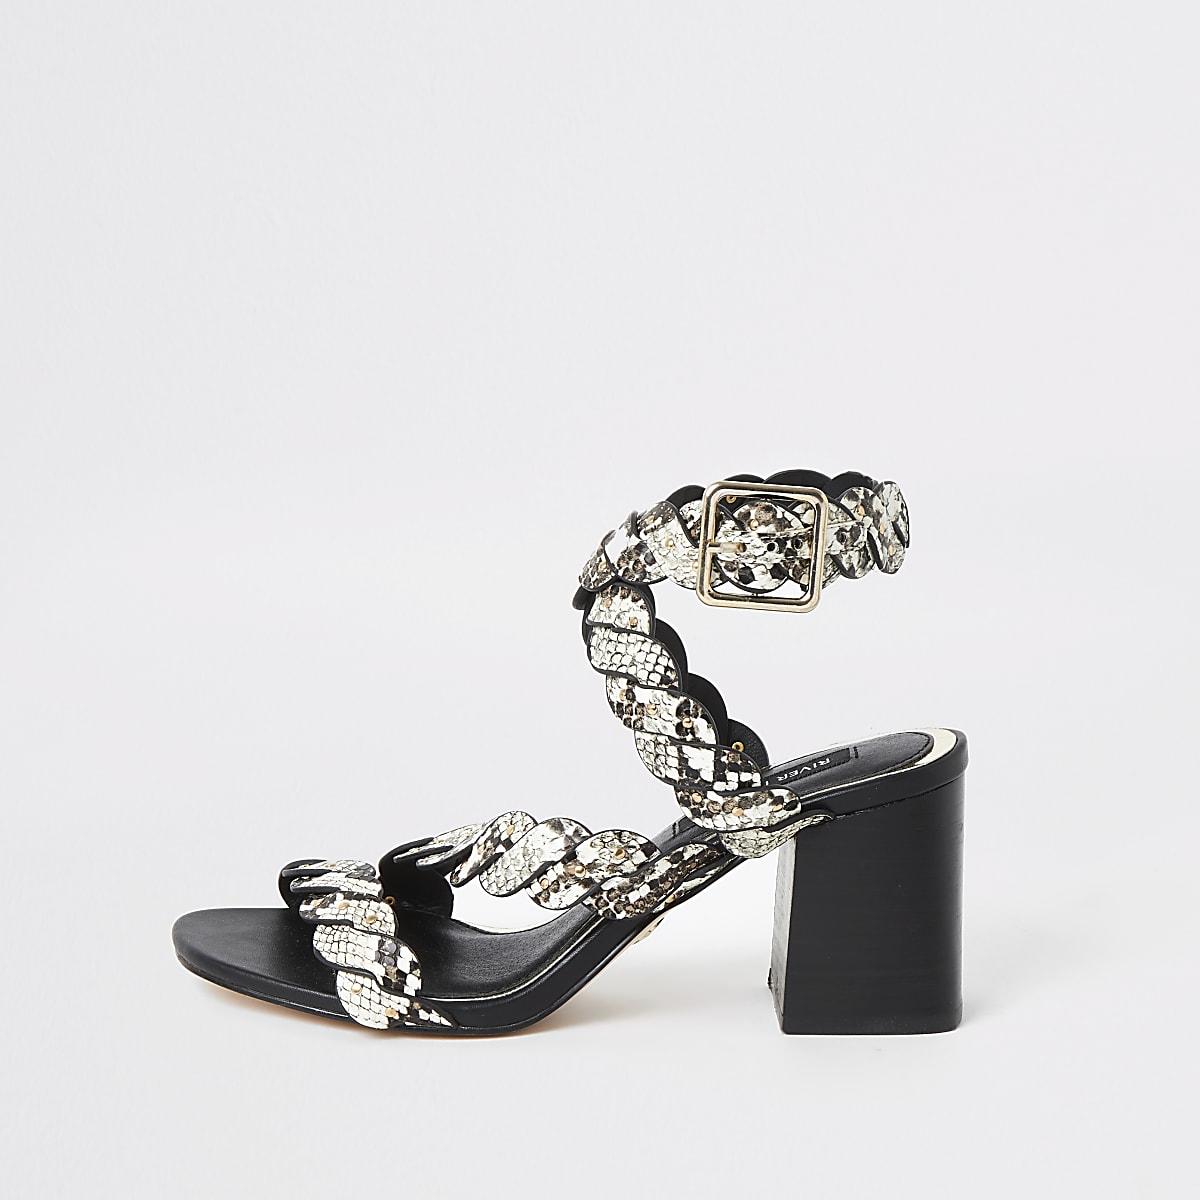 Grijze sandalen met slangenprint, studs en blokhak